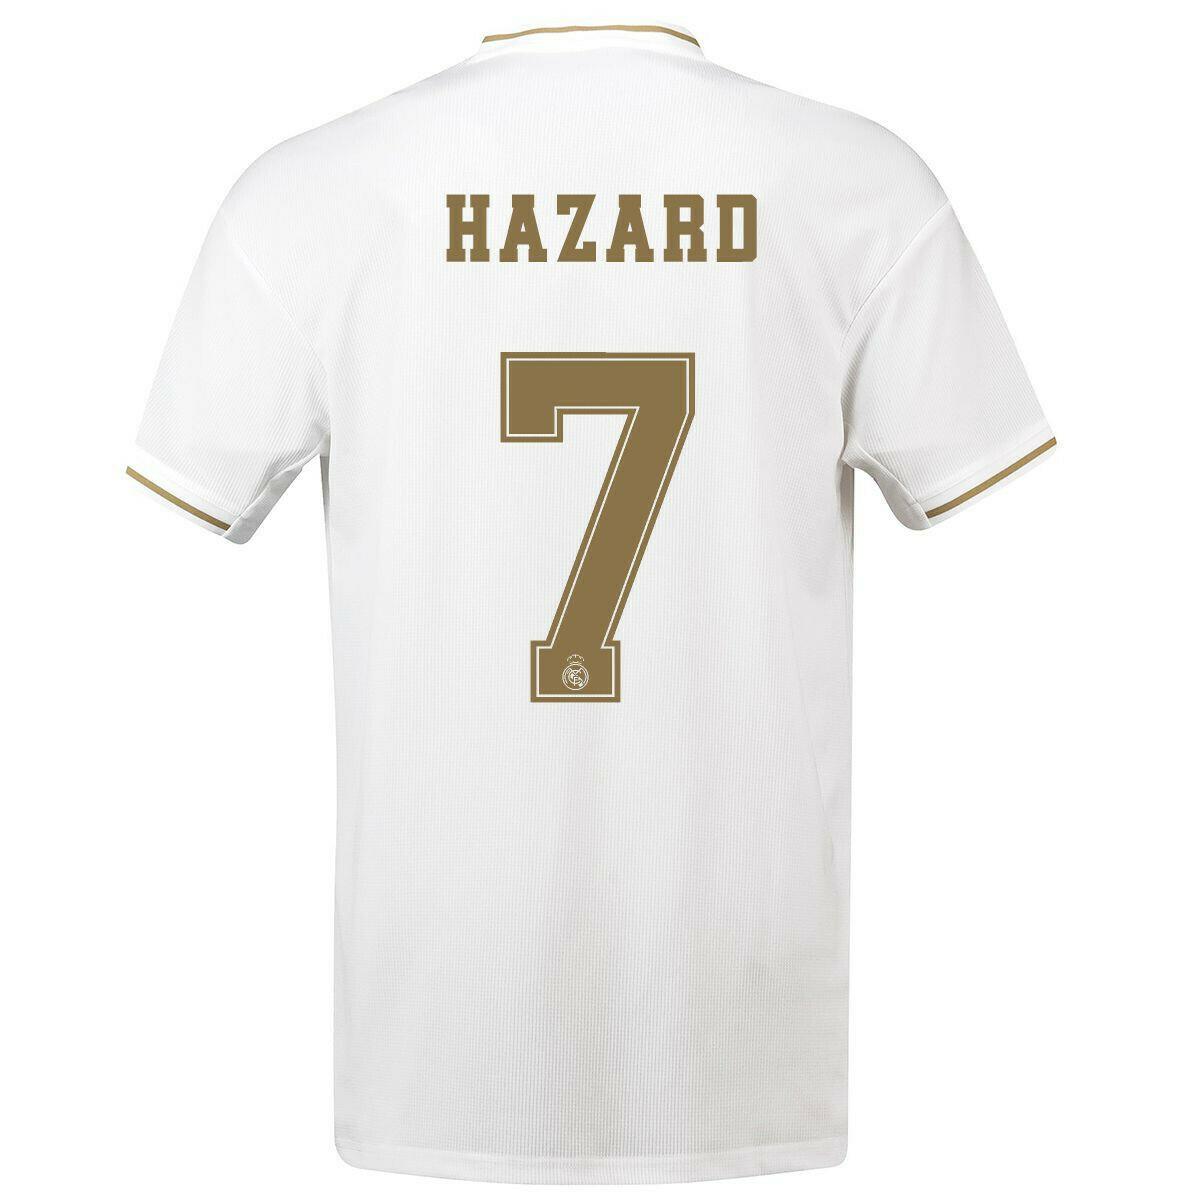 Adidas Real Madrid Hazard Jersey 19/20